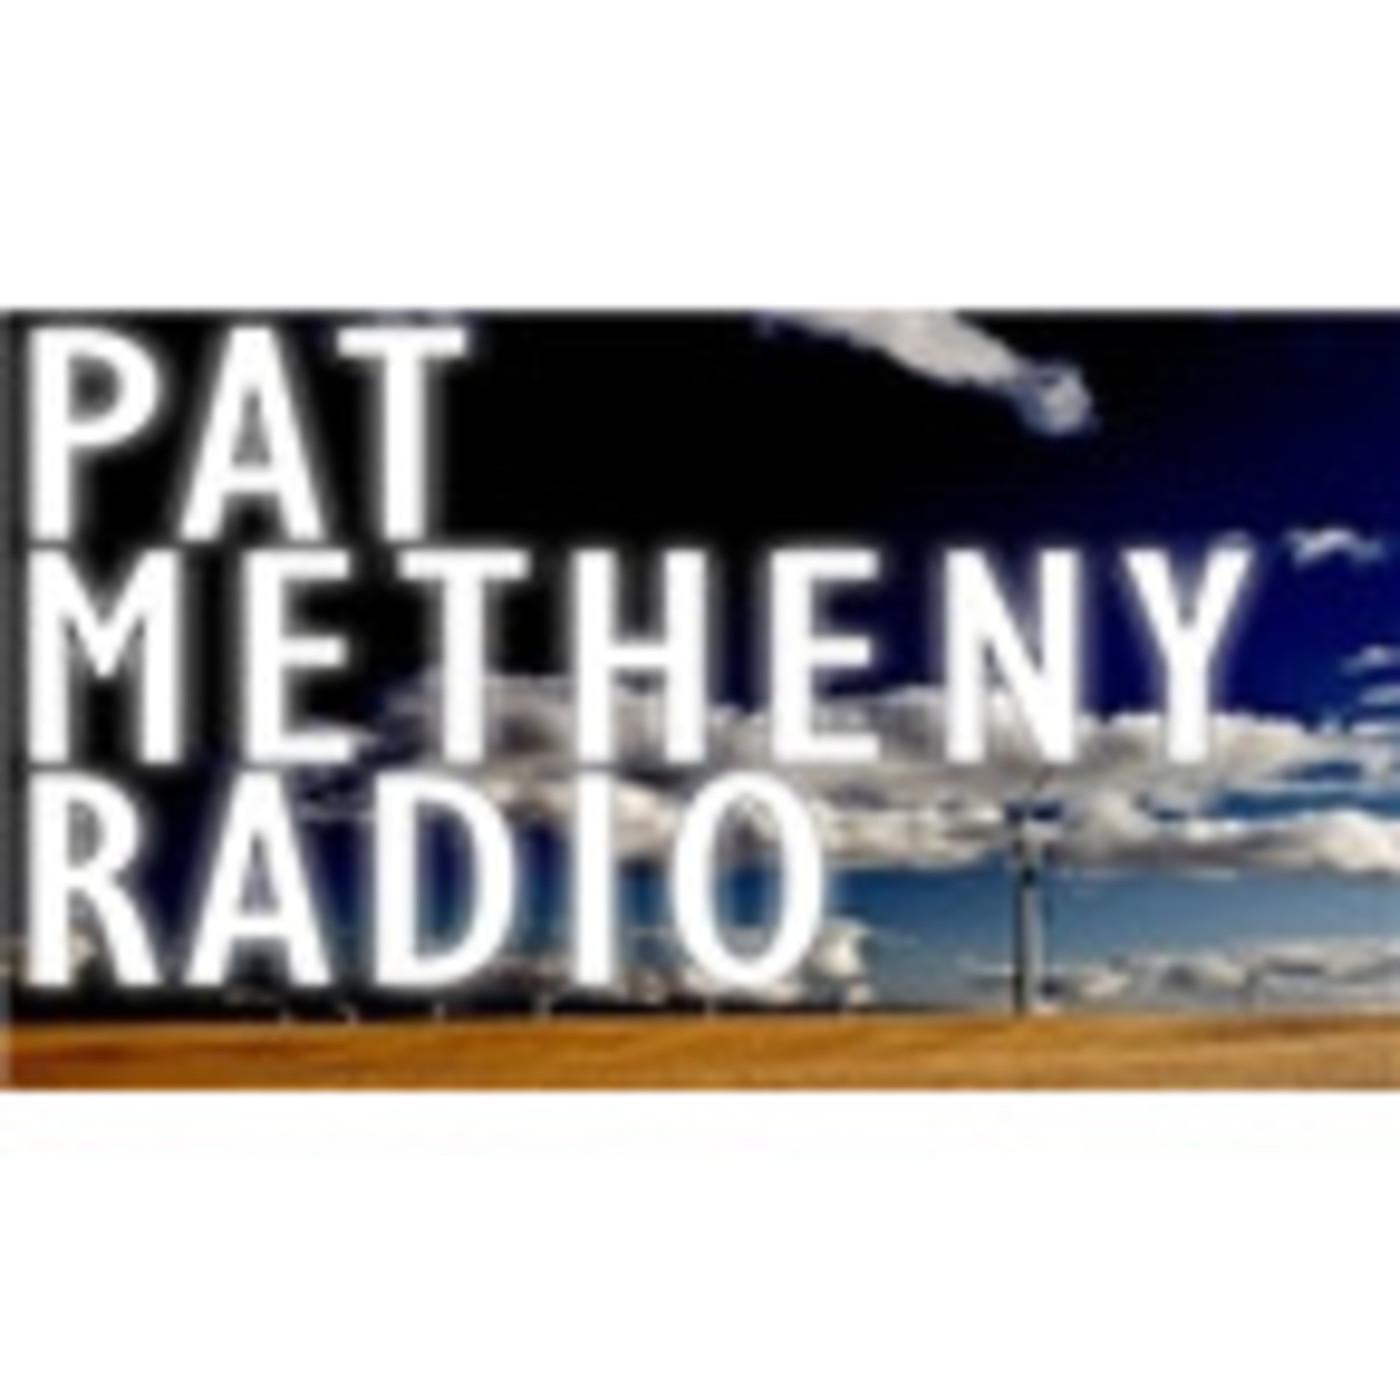 Pat Metheny Radio